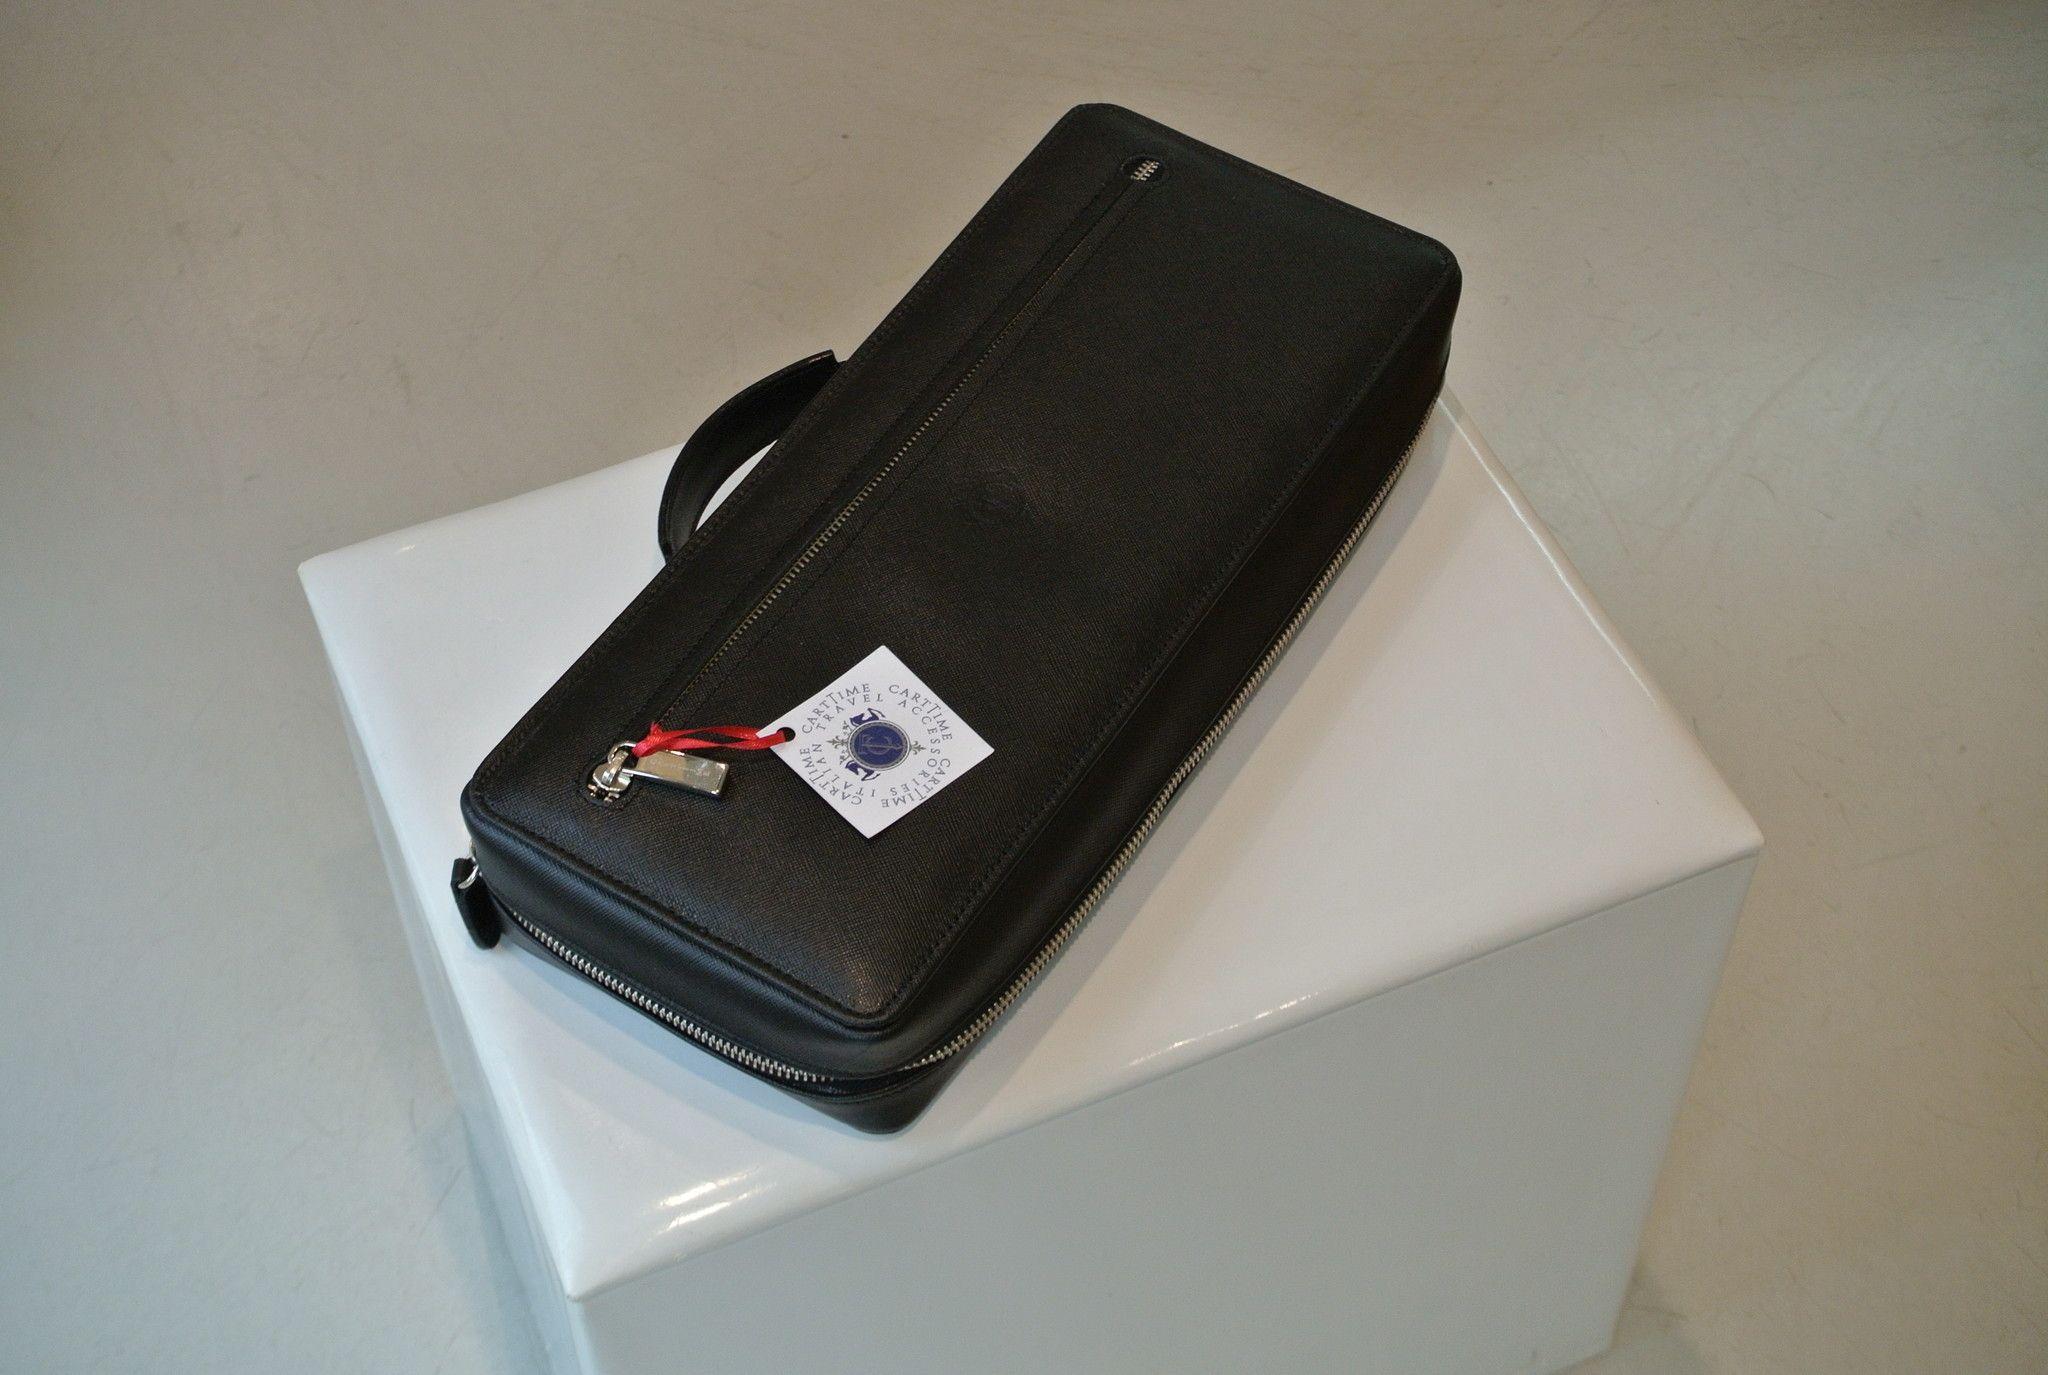 CARTIME borsa custodia portaorologi nera safiano 10 posti